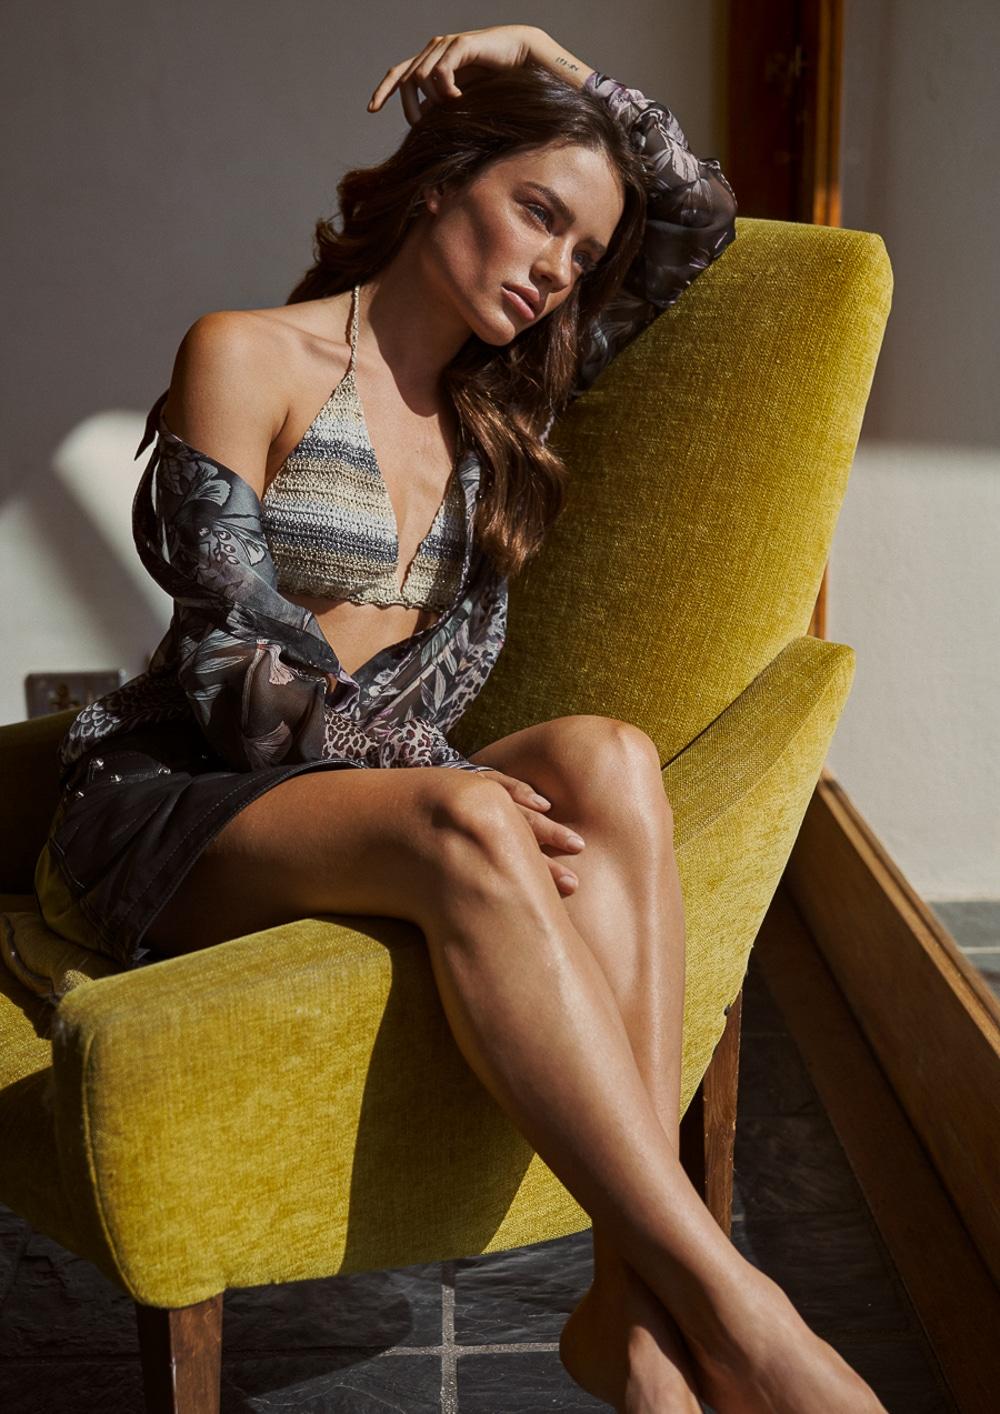 Jessica-Lee-Buchanan-Harpers-Bazaar-Bulgaria-August-2018-Stephan-Glathe-7.jpg